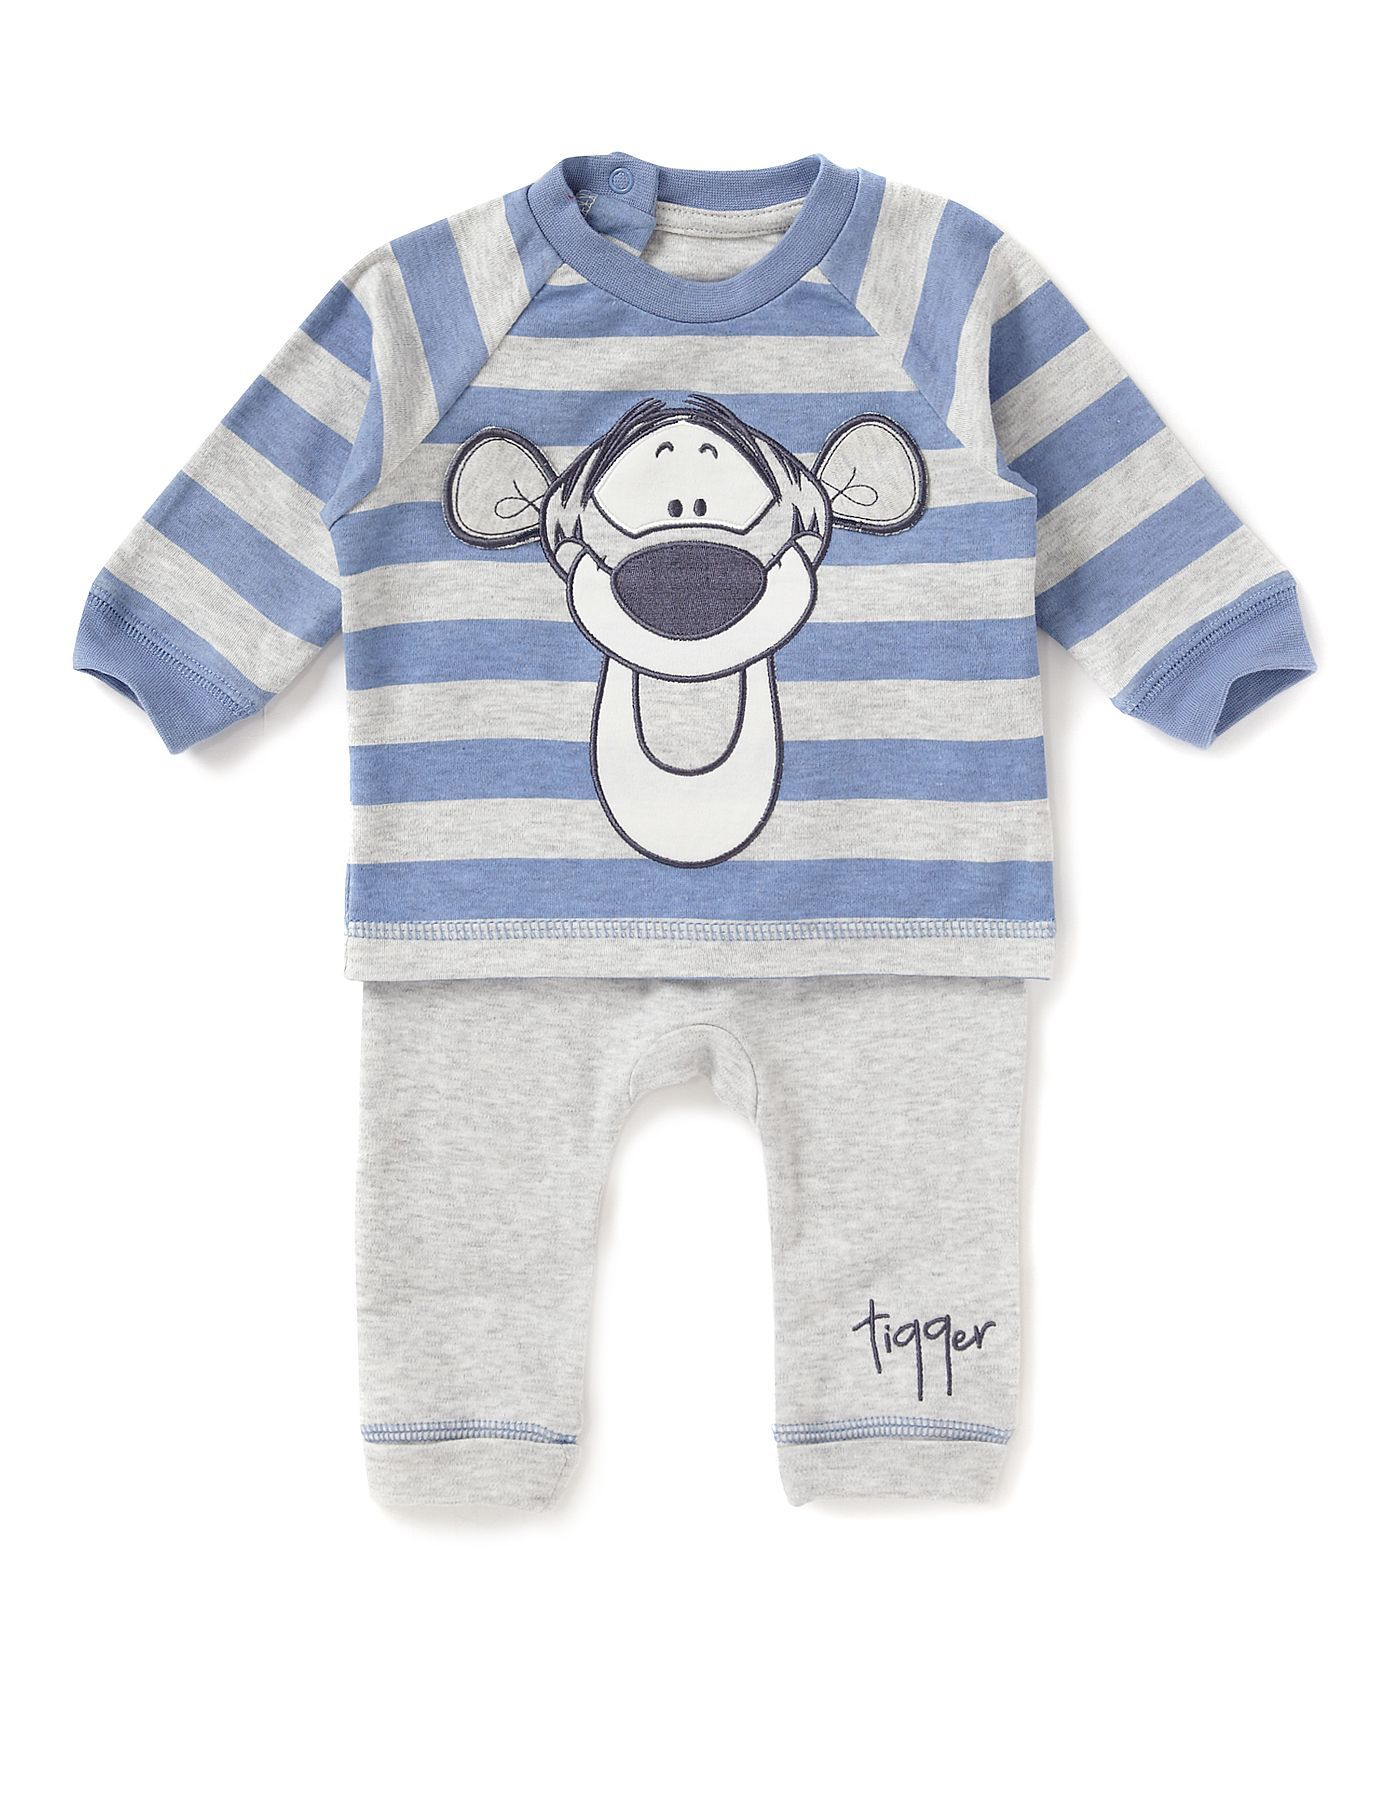 Tigger Jersey Baby Outfit Baby George at ASDA